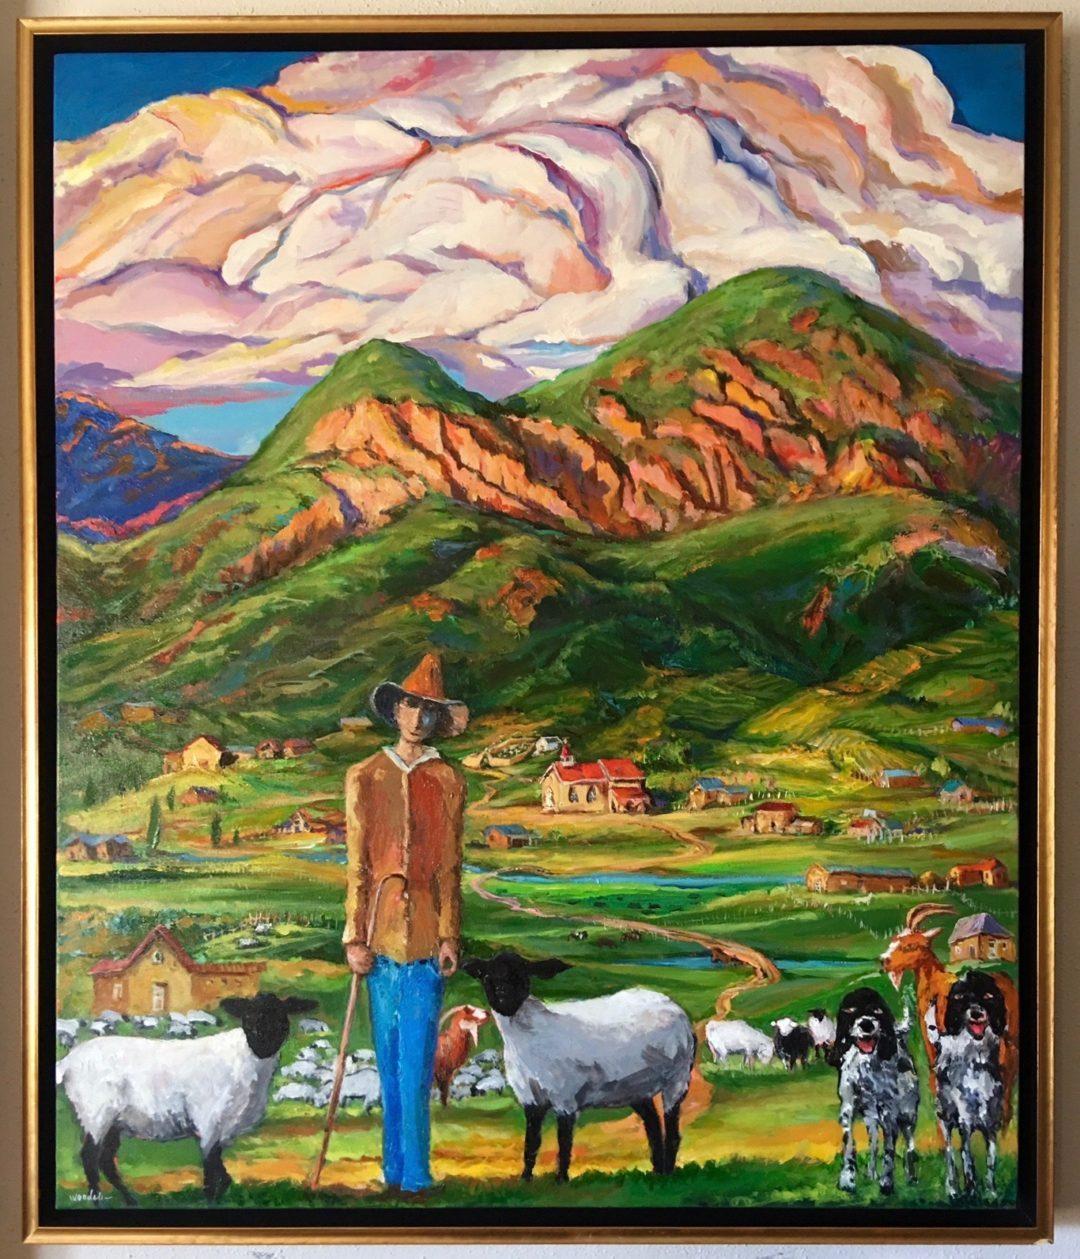 The Shepherd of Taos